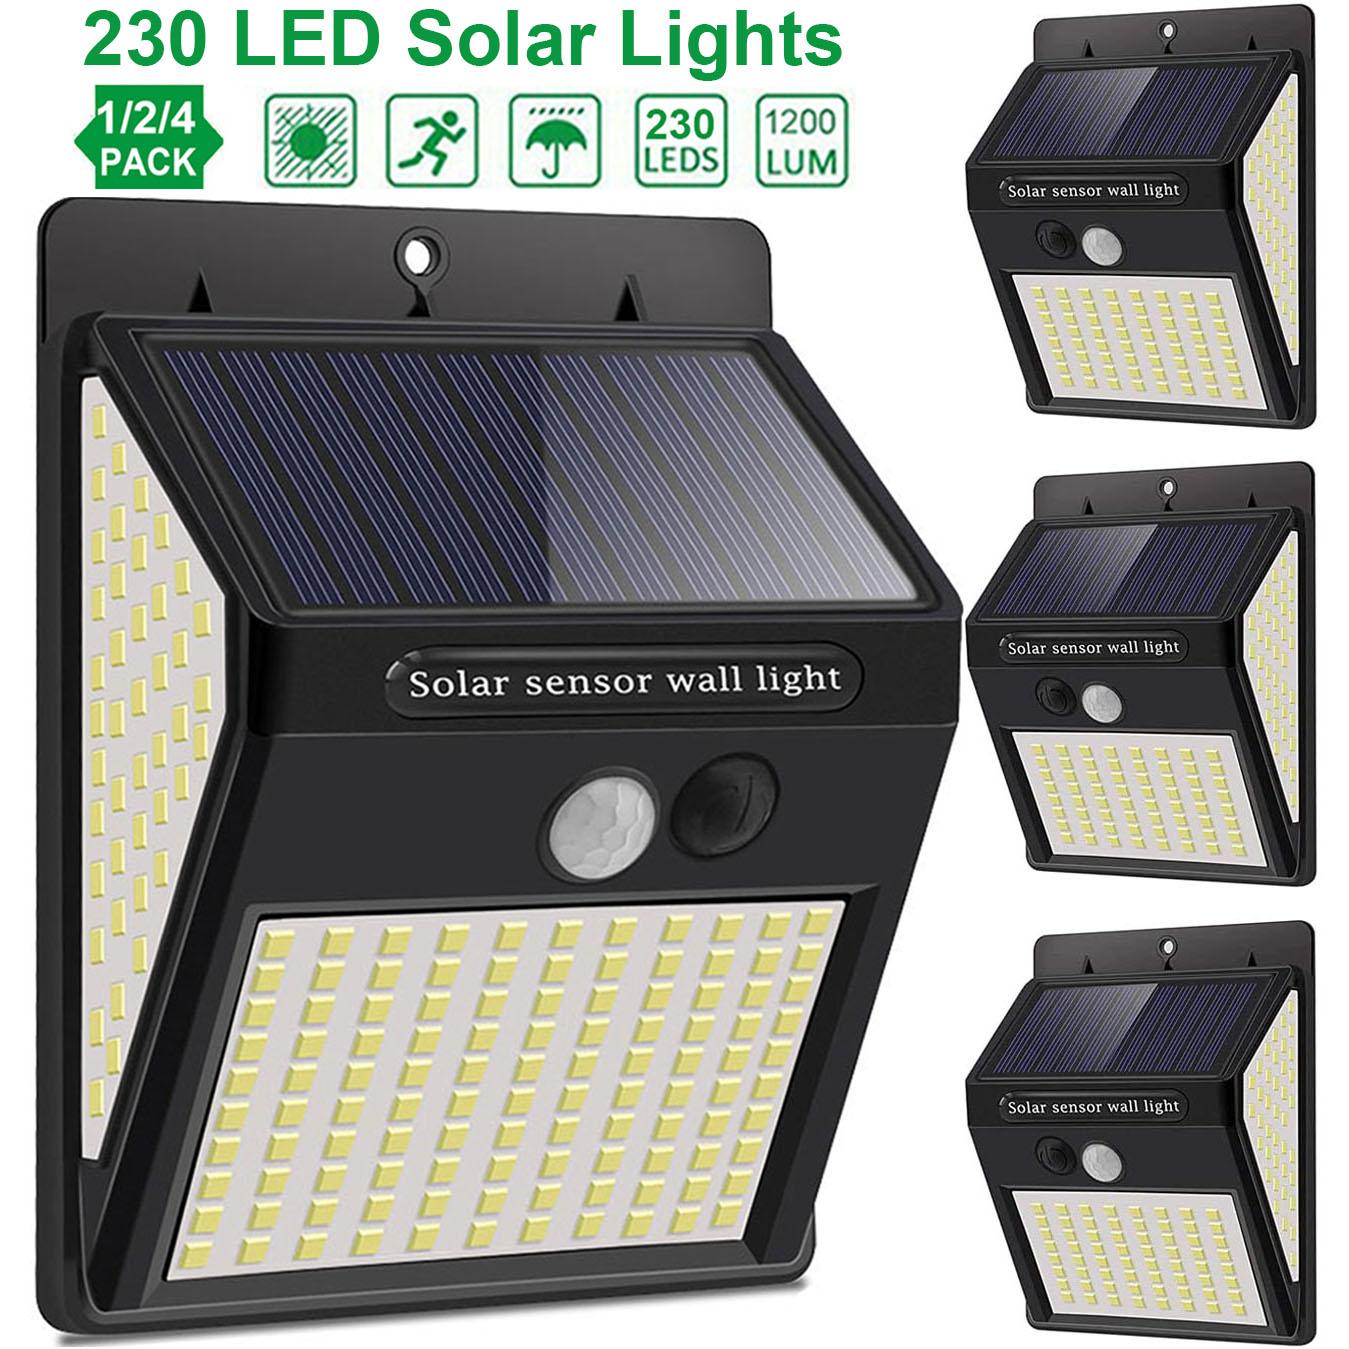 3Mode Waterproof 230 LED Solar Motion Sensor Lights Outdoor Sunlight Solar Powered Street Wall Lamp for Garden Decoration 1-4pcs